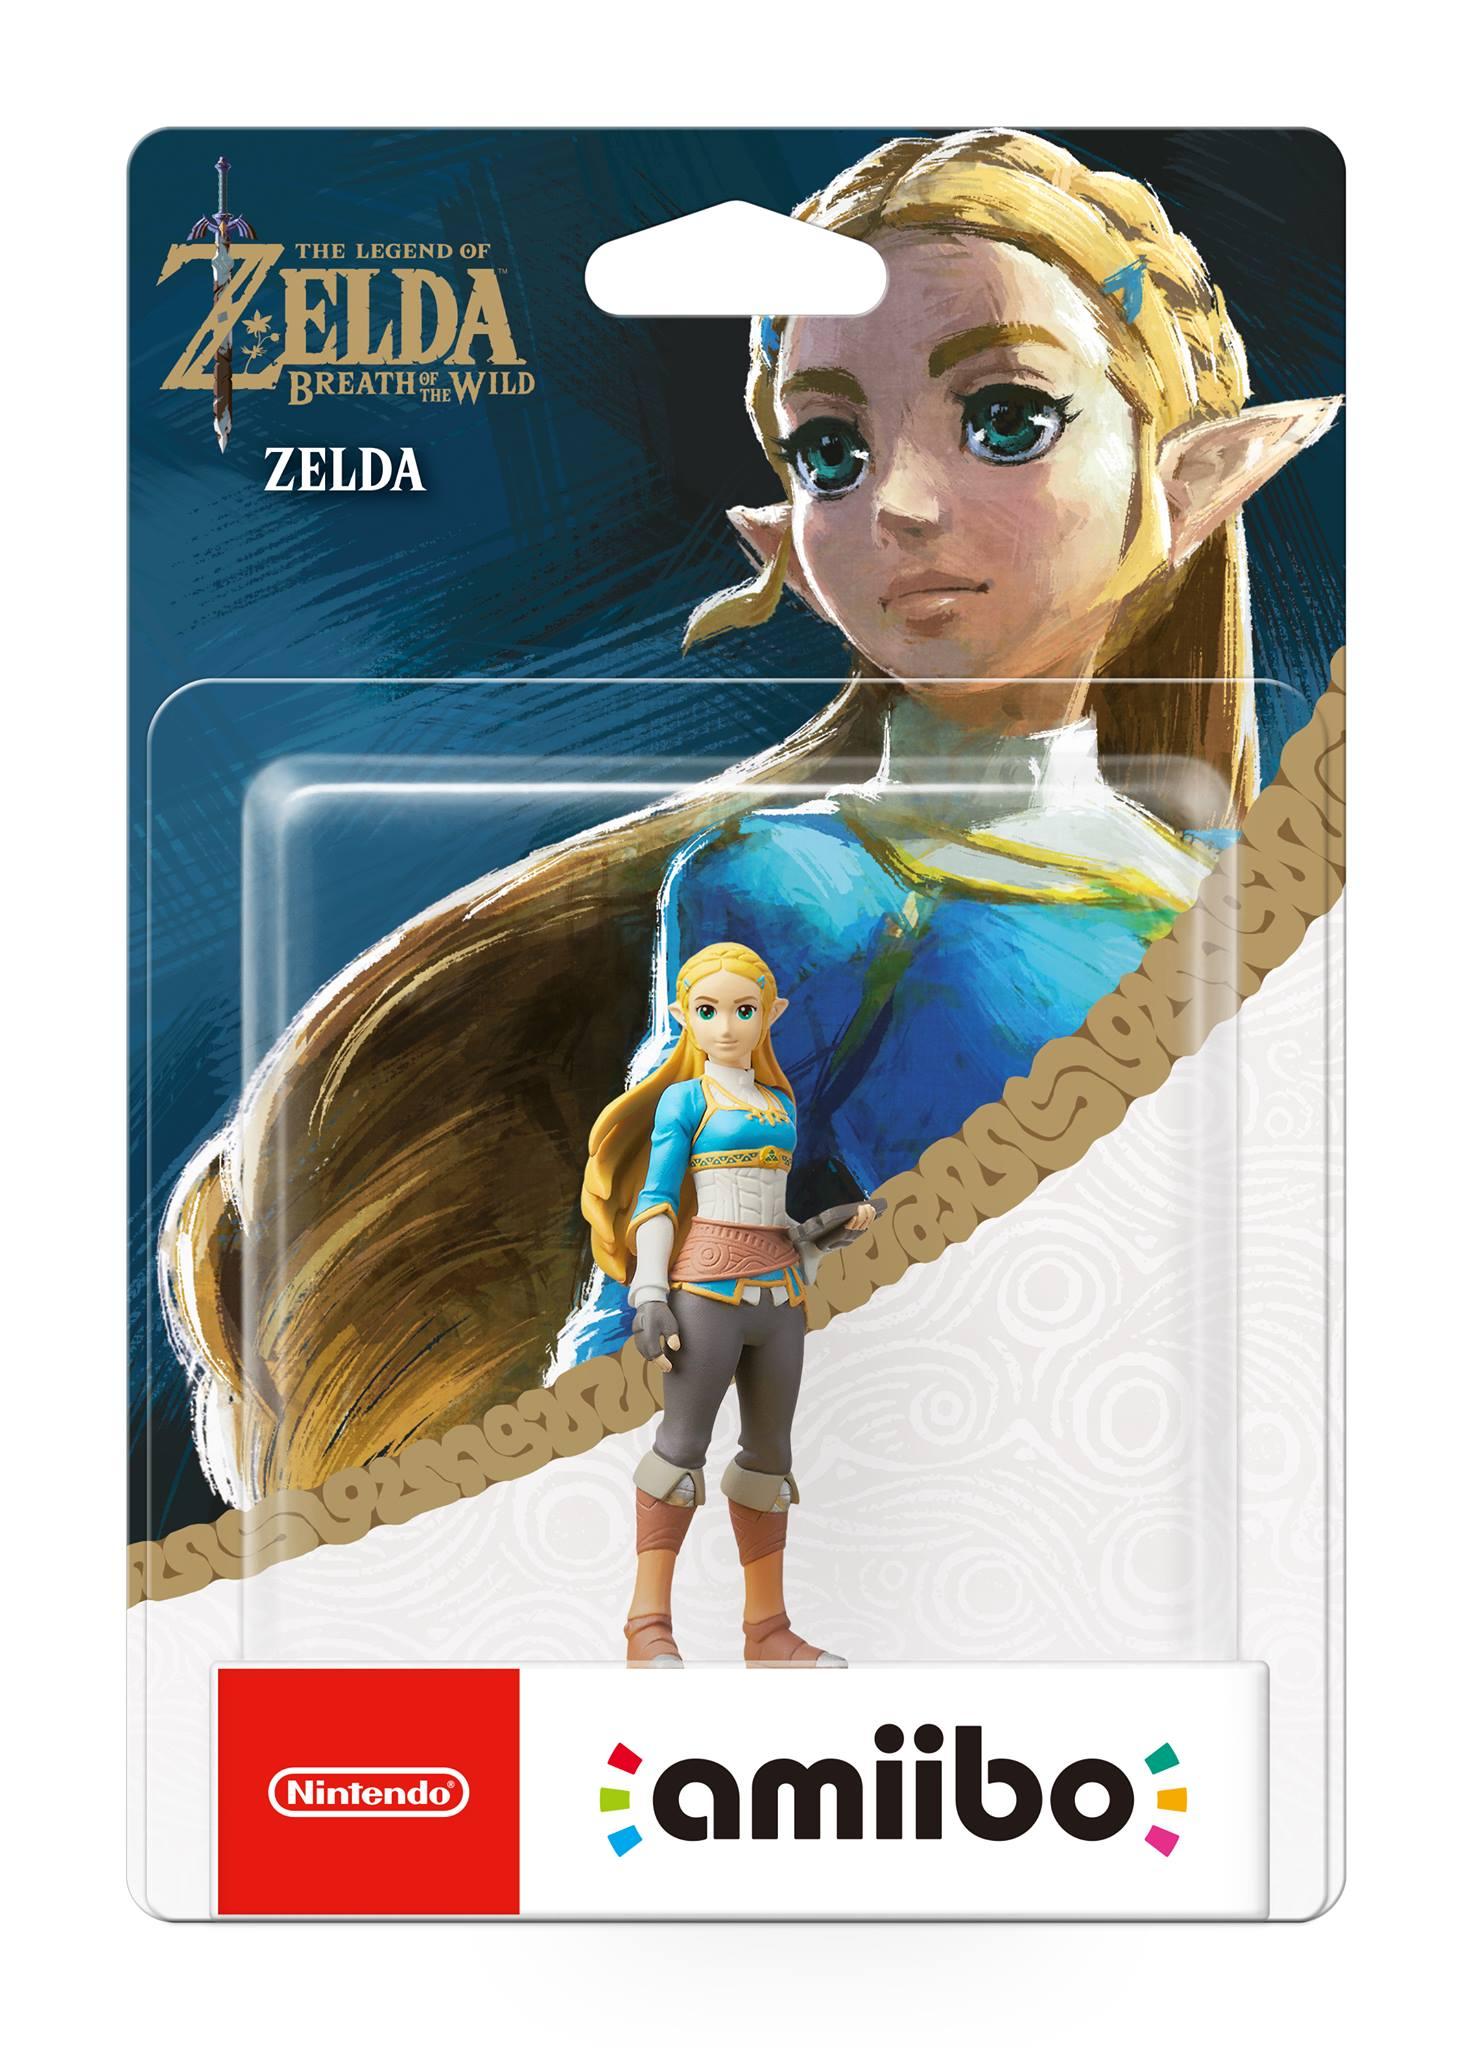 Link a the-legend-of-zelda-breath-of-the-wild-amiibo-nintendo-foto-10